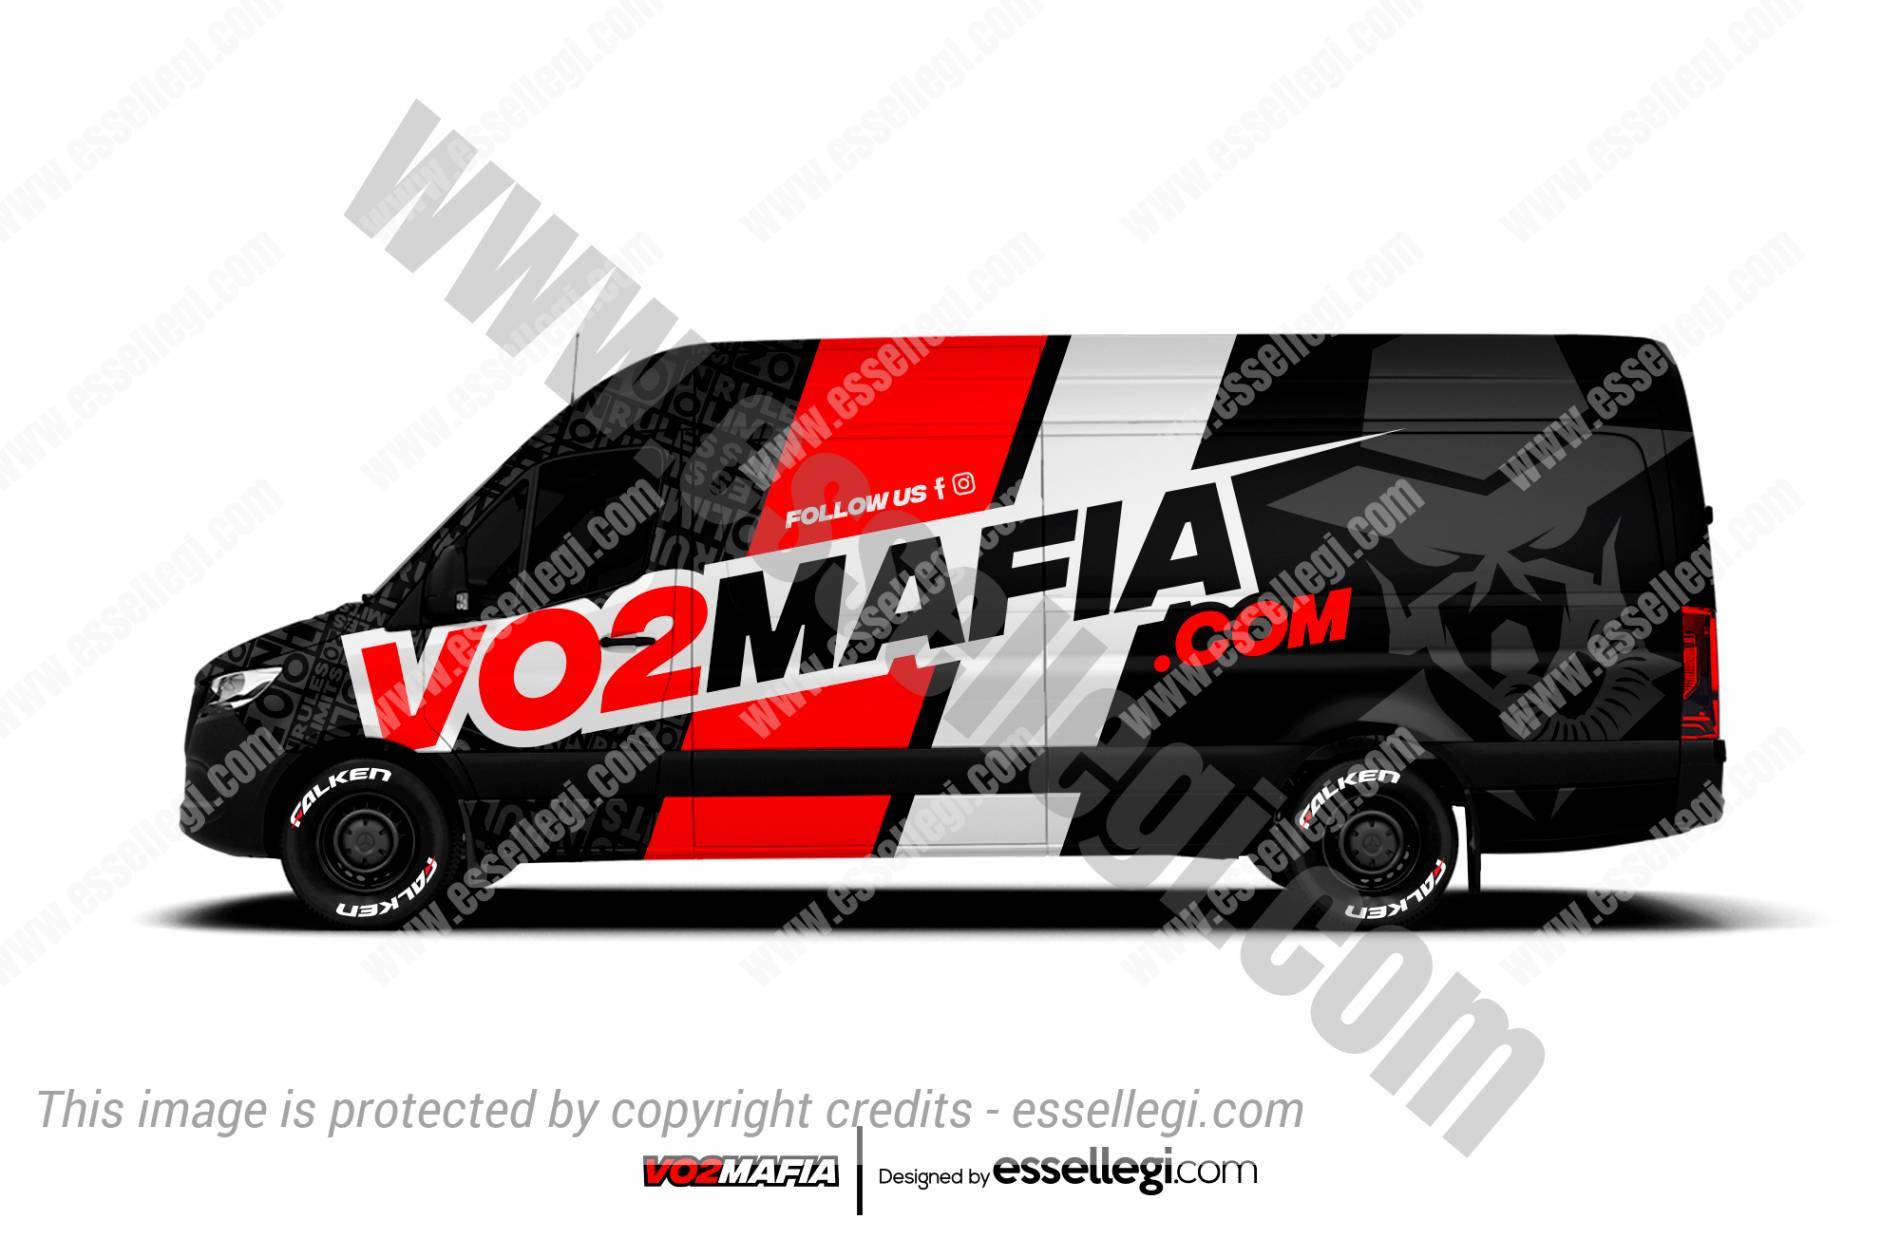 VO2 MAFIA | VAN WRAP DESIGN 🇺🇸